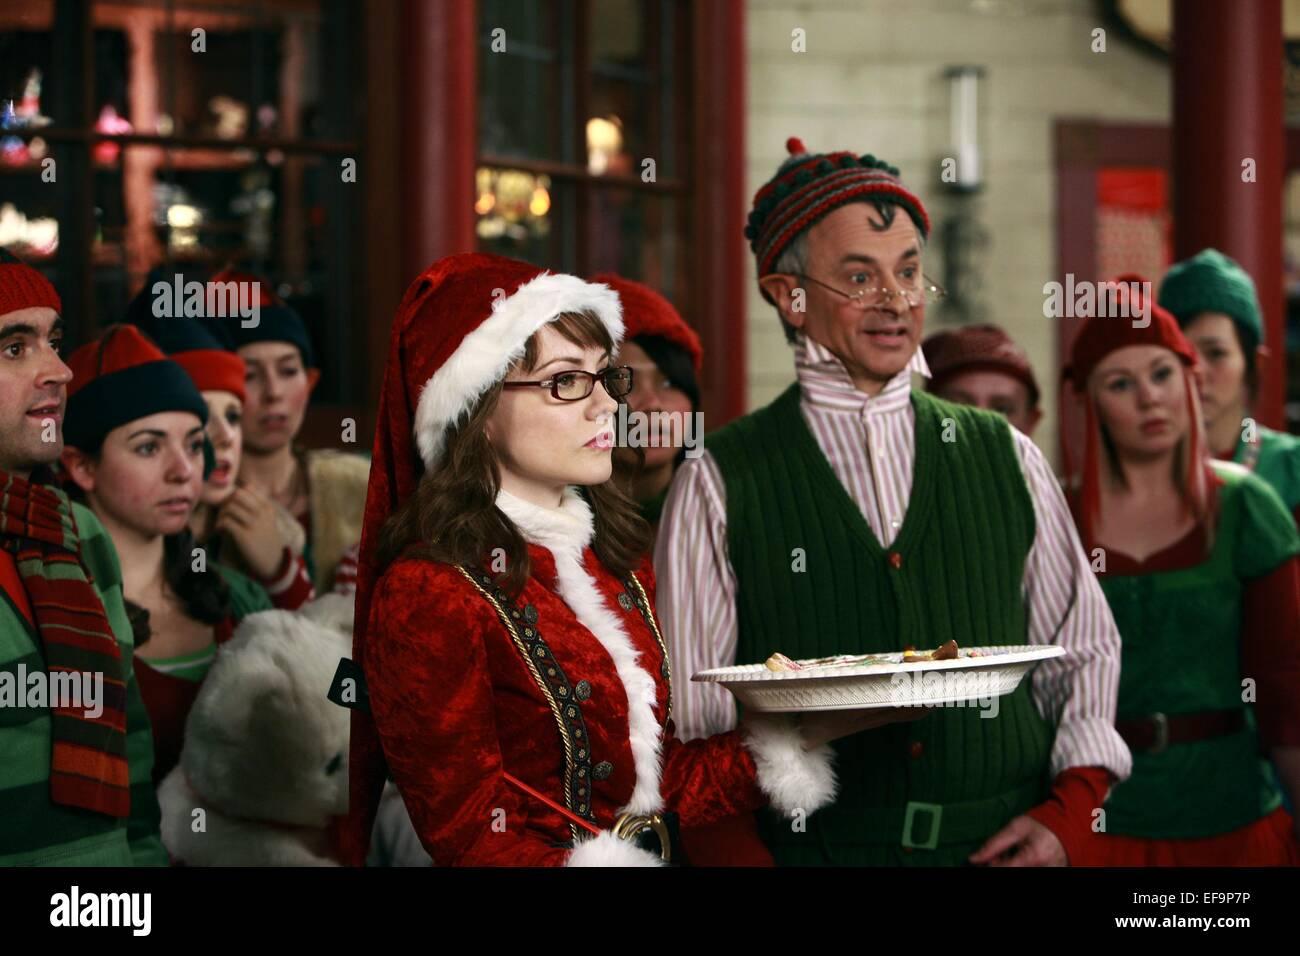 KELLY STABLES & RICHARD SIDE SANTA BABY 2: CHRISTMAS MAYBE ...